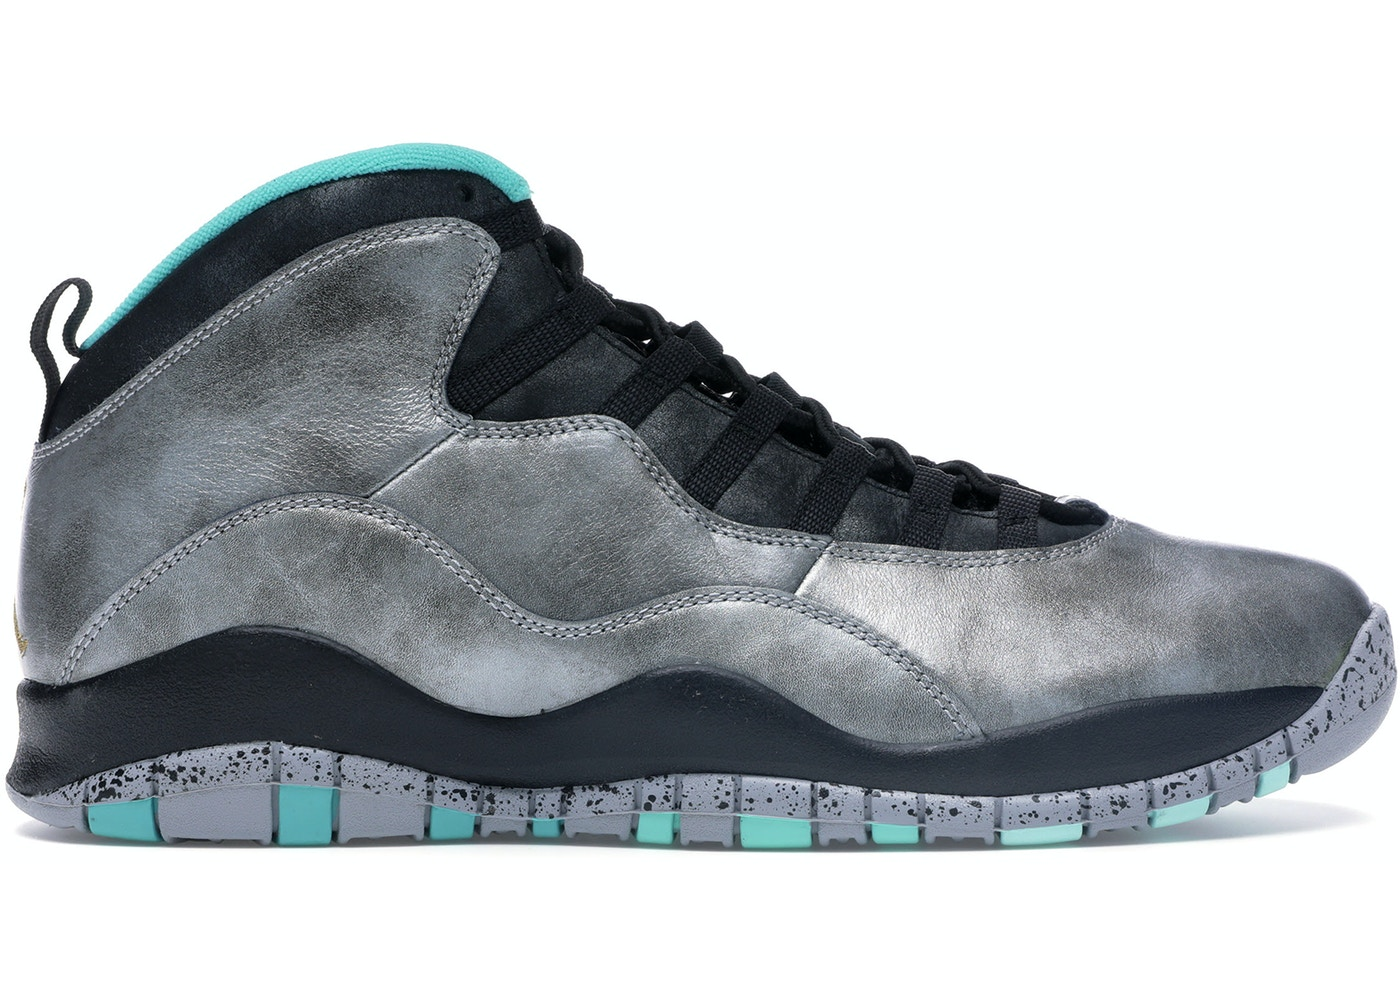 new style ed67c 032ed Buy Air Jordan 10 Shoes   Deadstock Sneakers